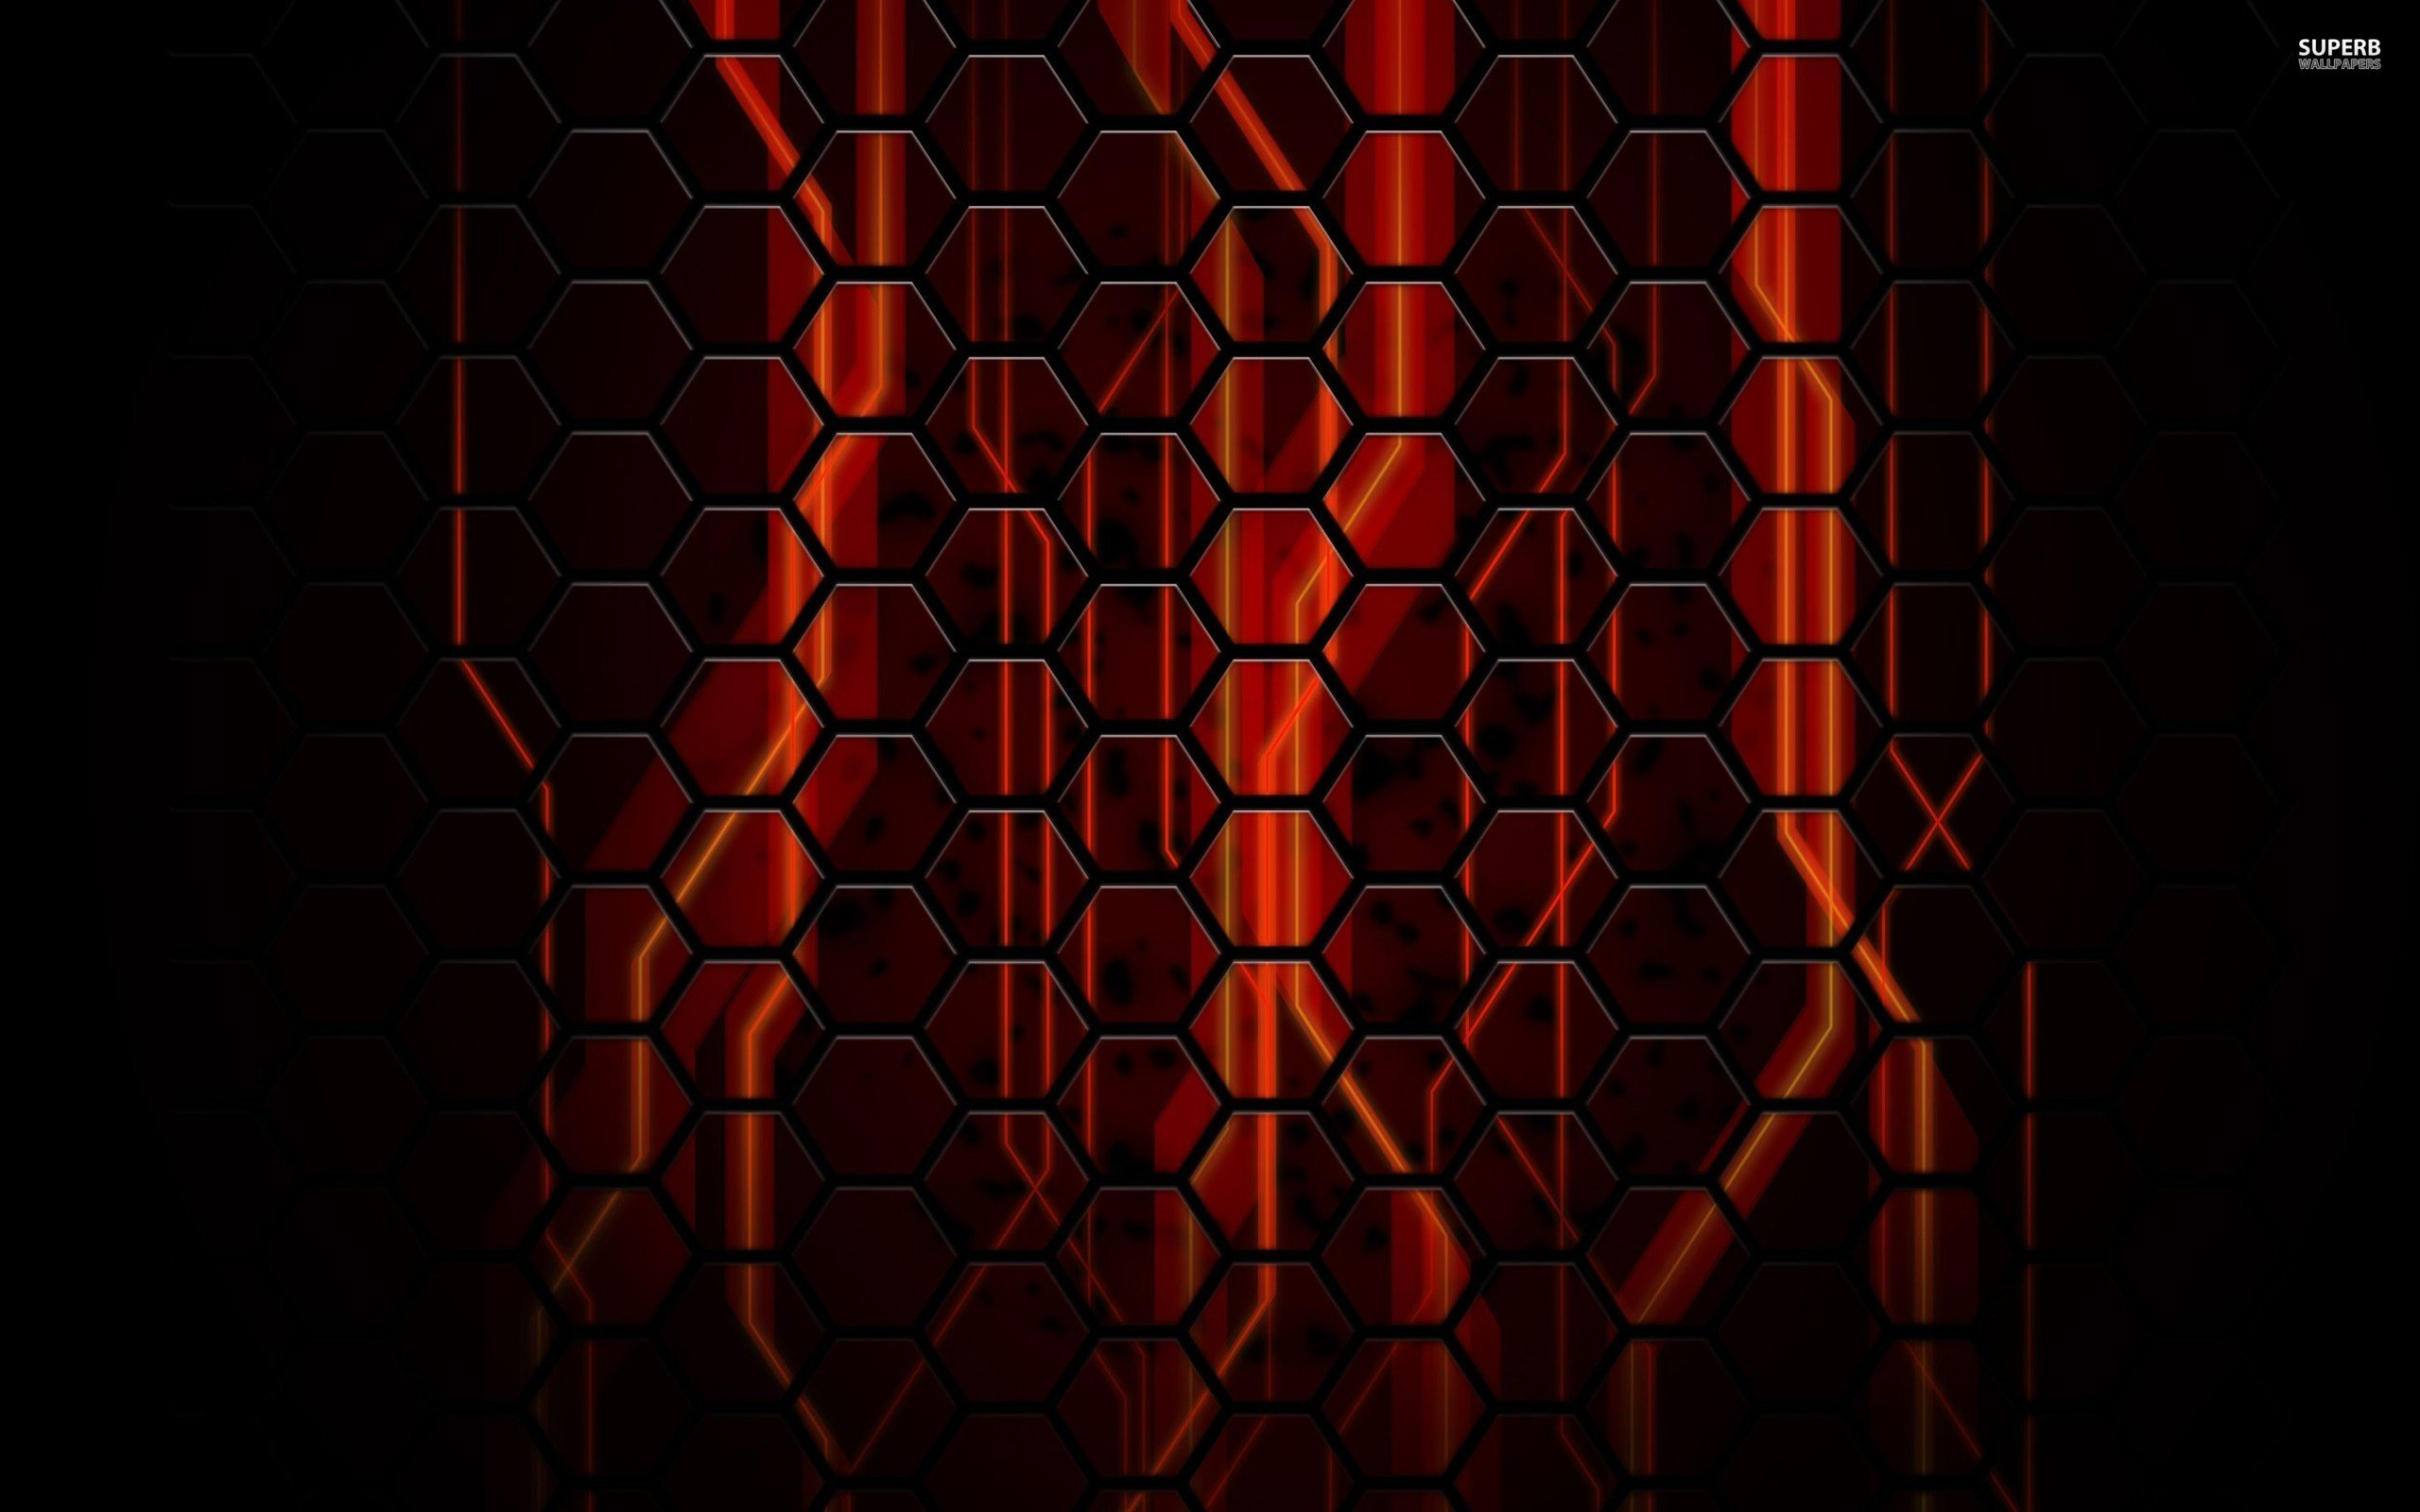 Msi wallpapers and background - Honeycomb Wallpaper Wallpapersafari